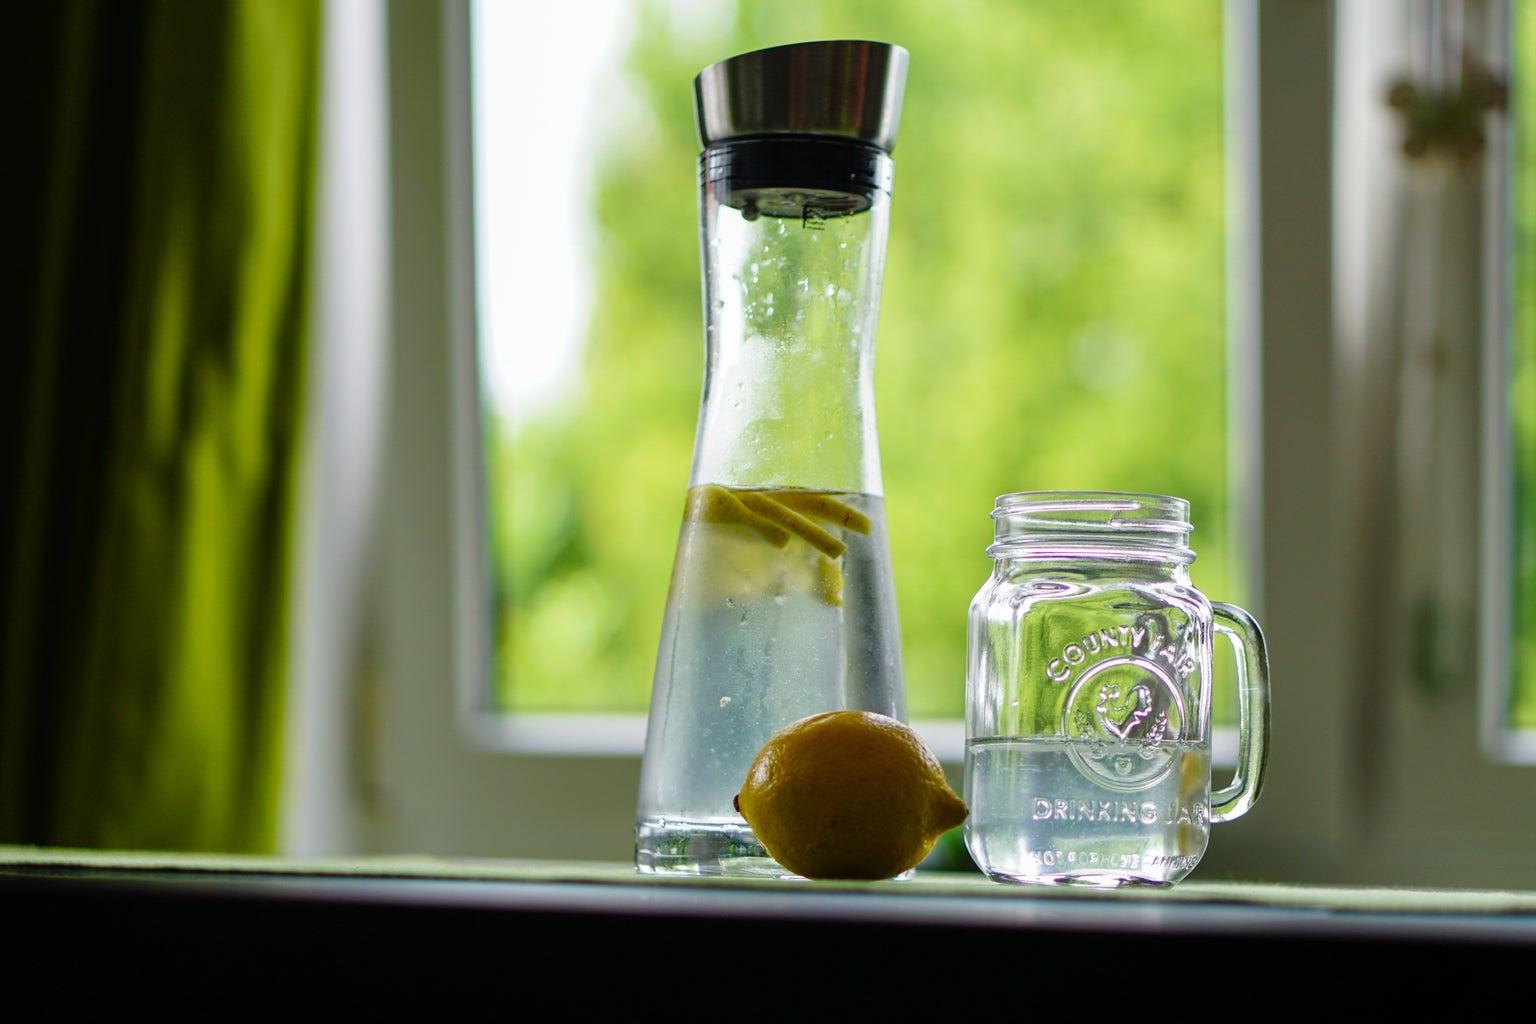 Jar with lemon